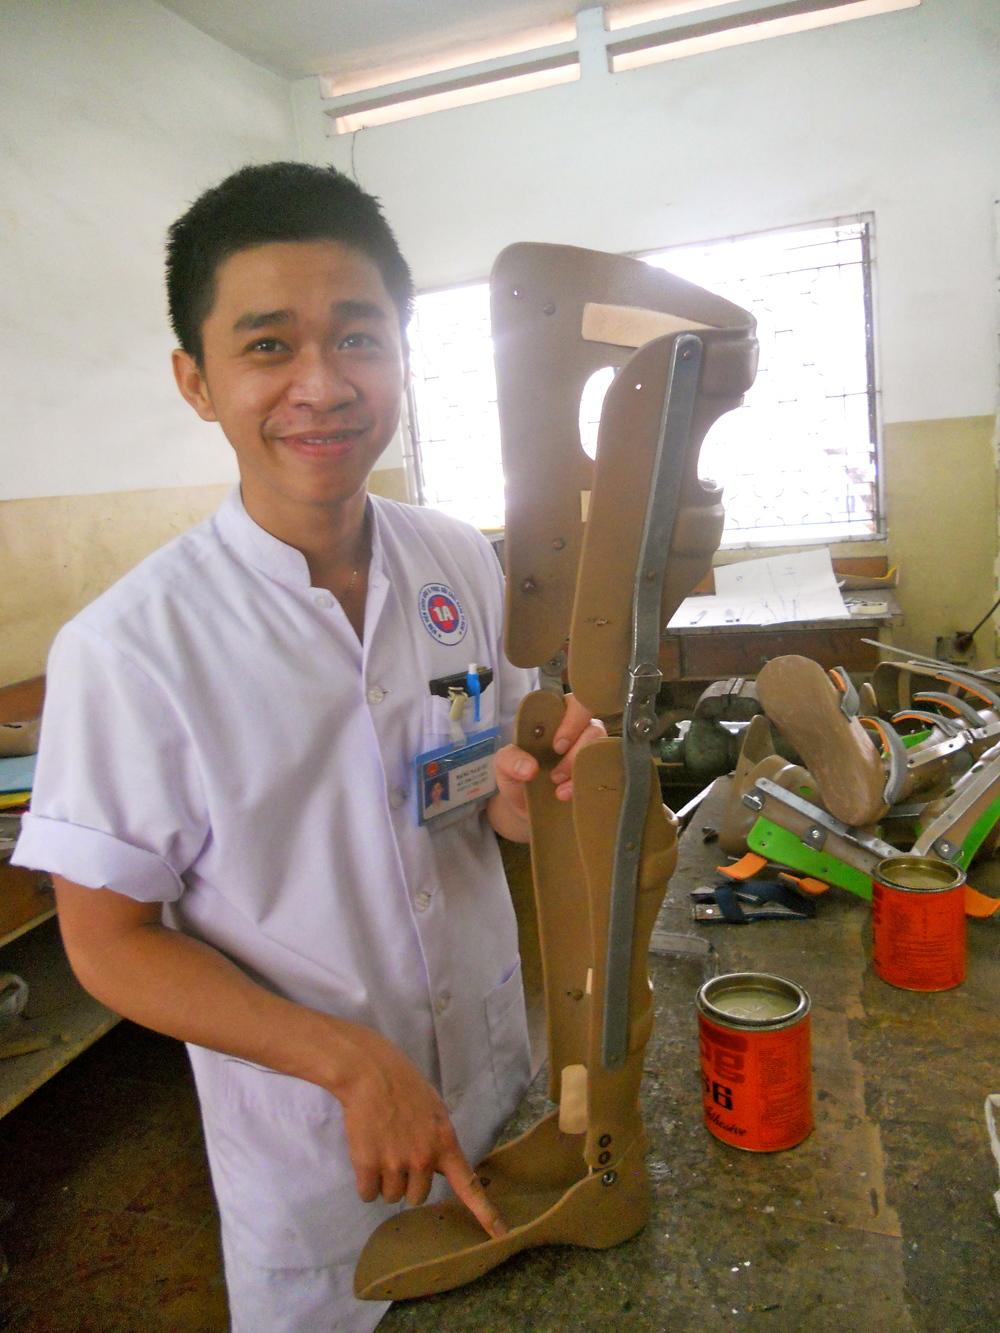 Fabricating Orthotics in Vietnam.jpg